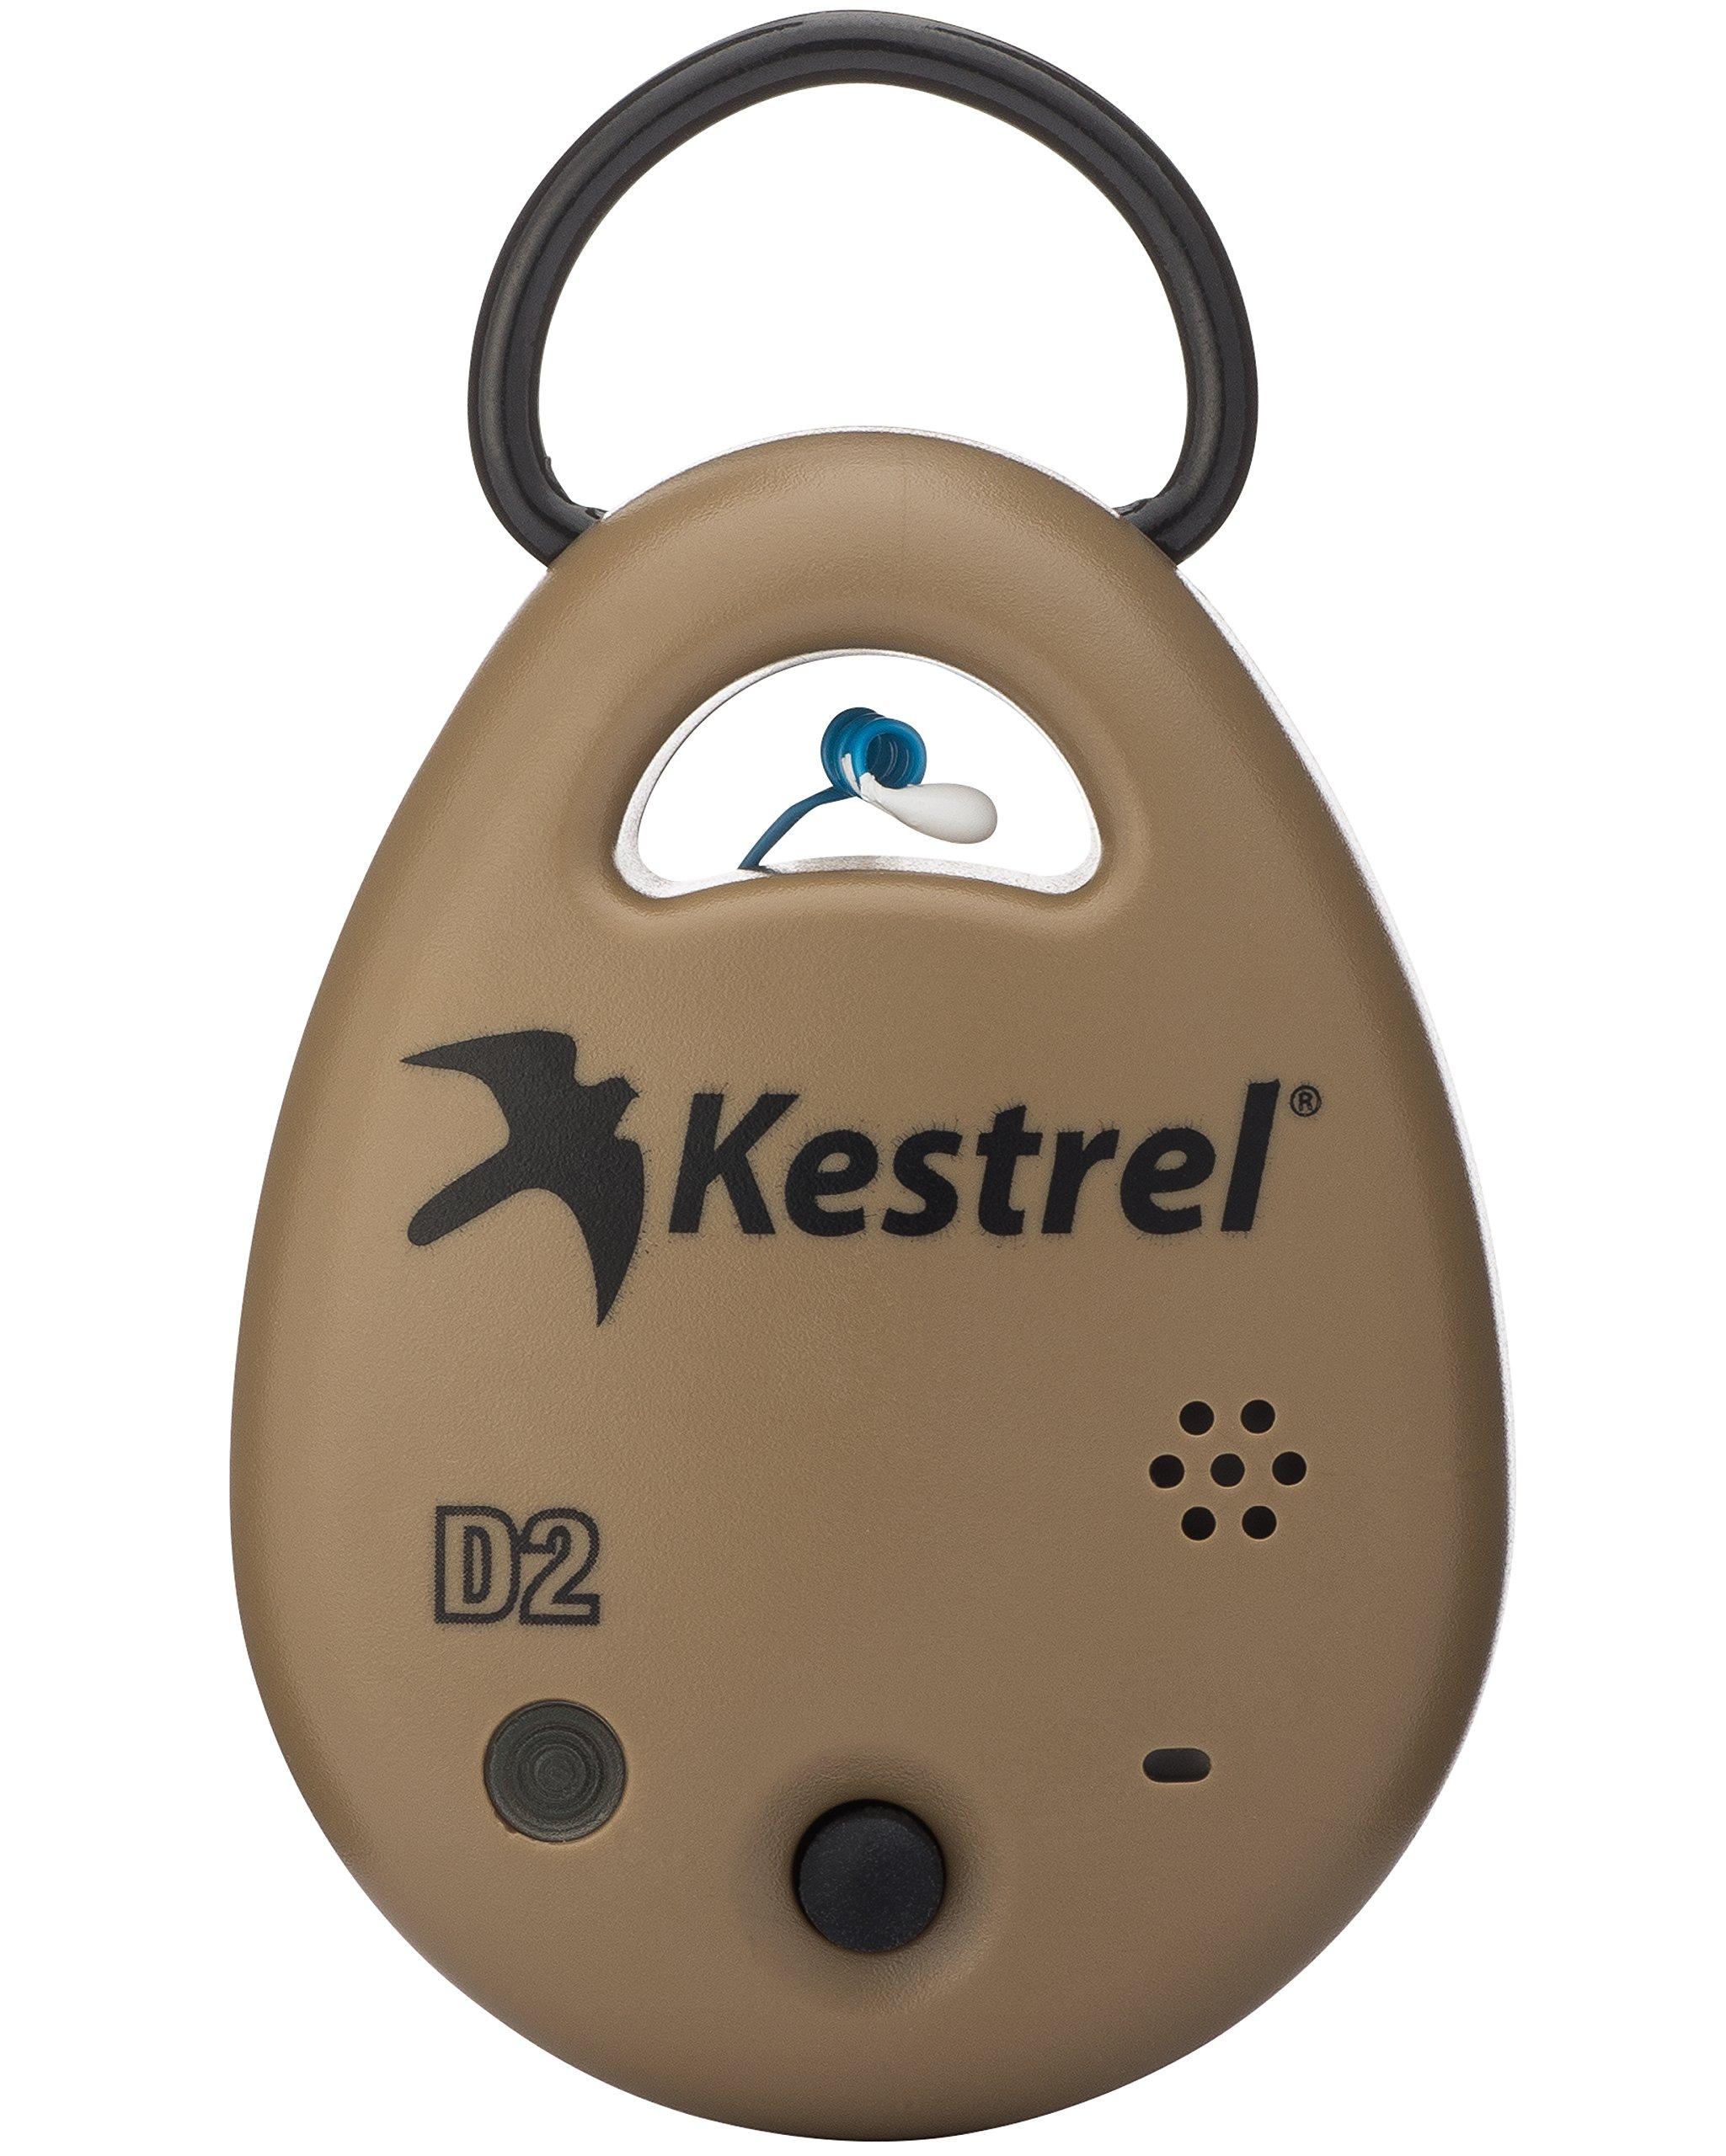 Kestrel Drop 2 Smart Humidity Data Logger by Kestrel